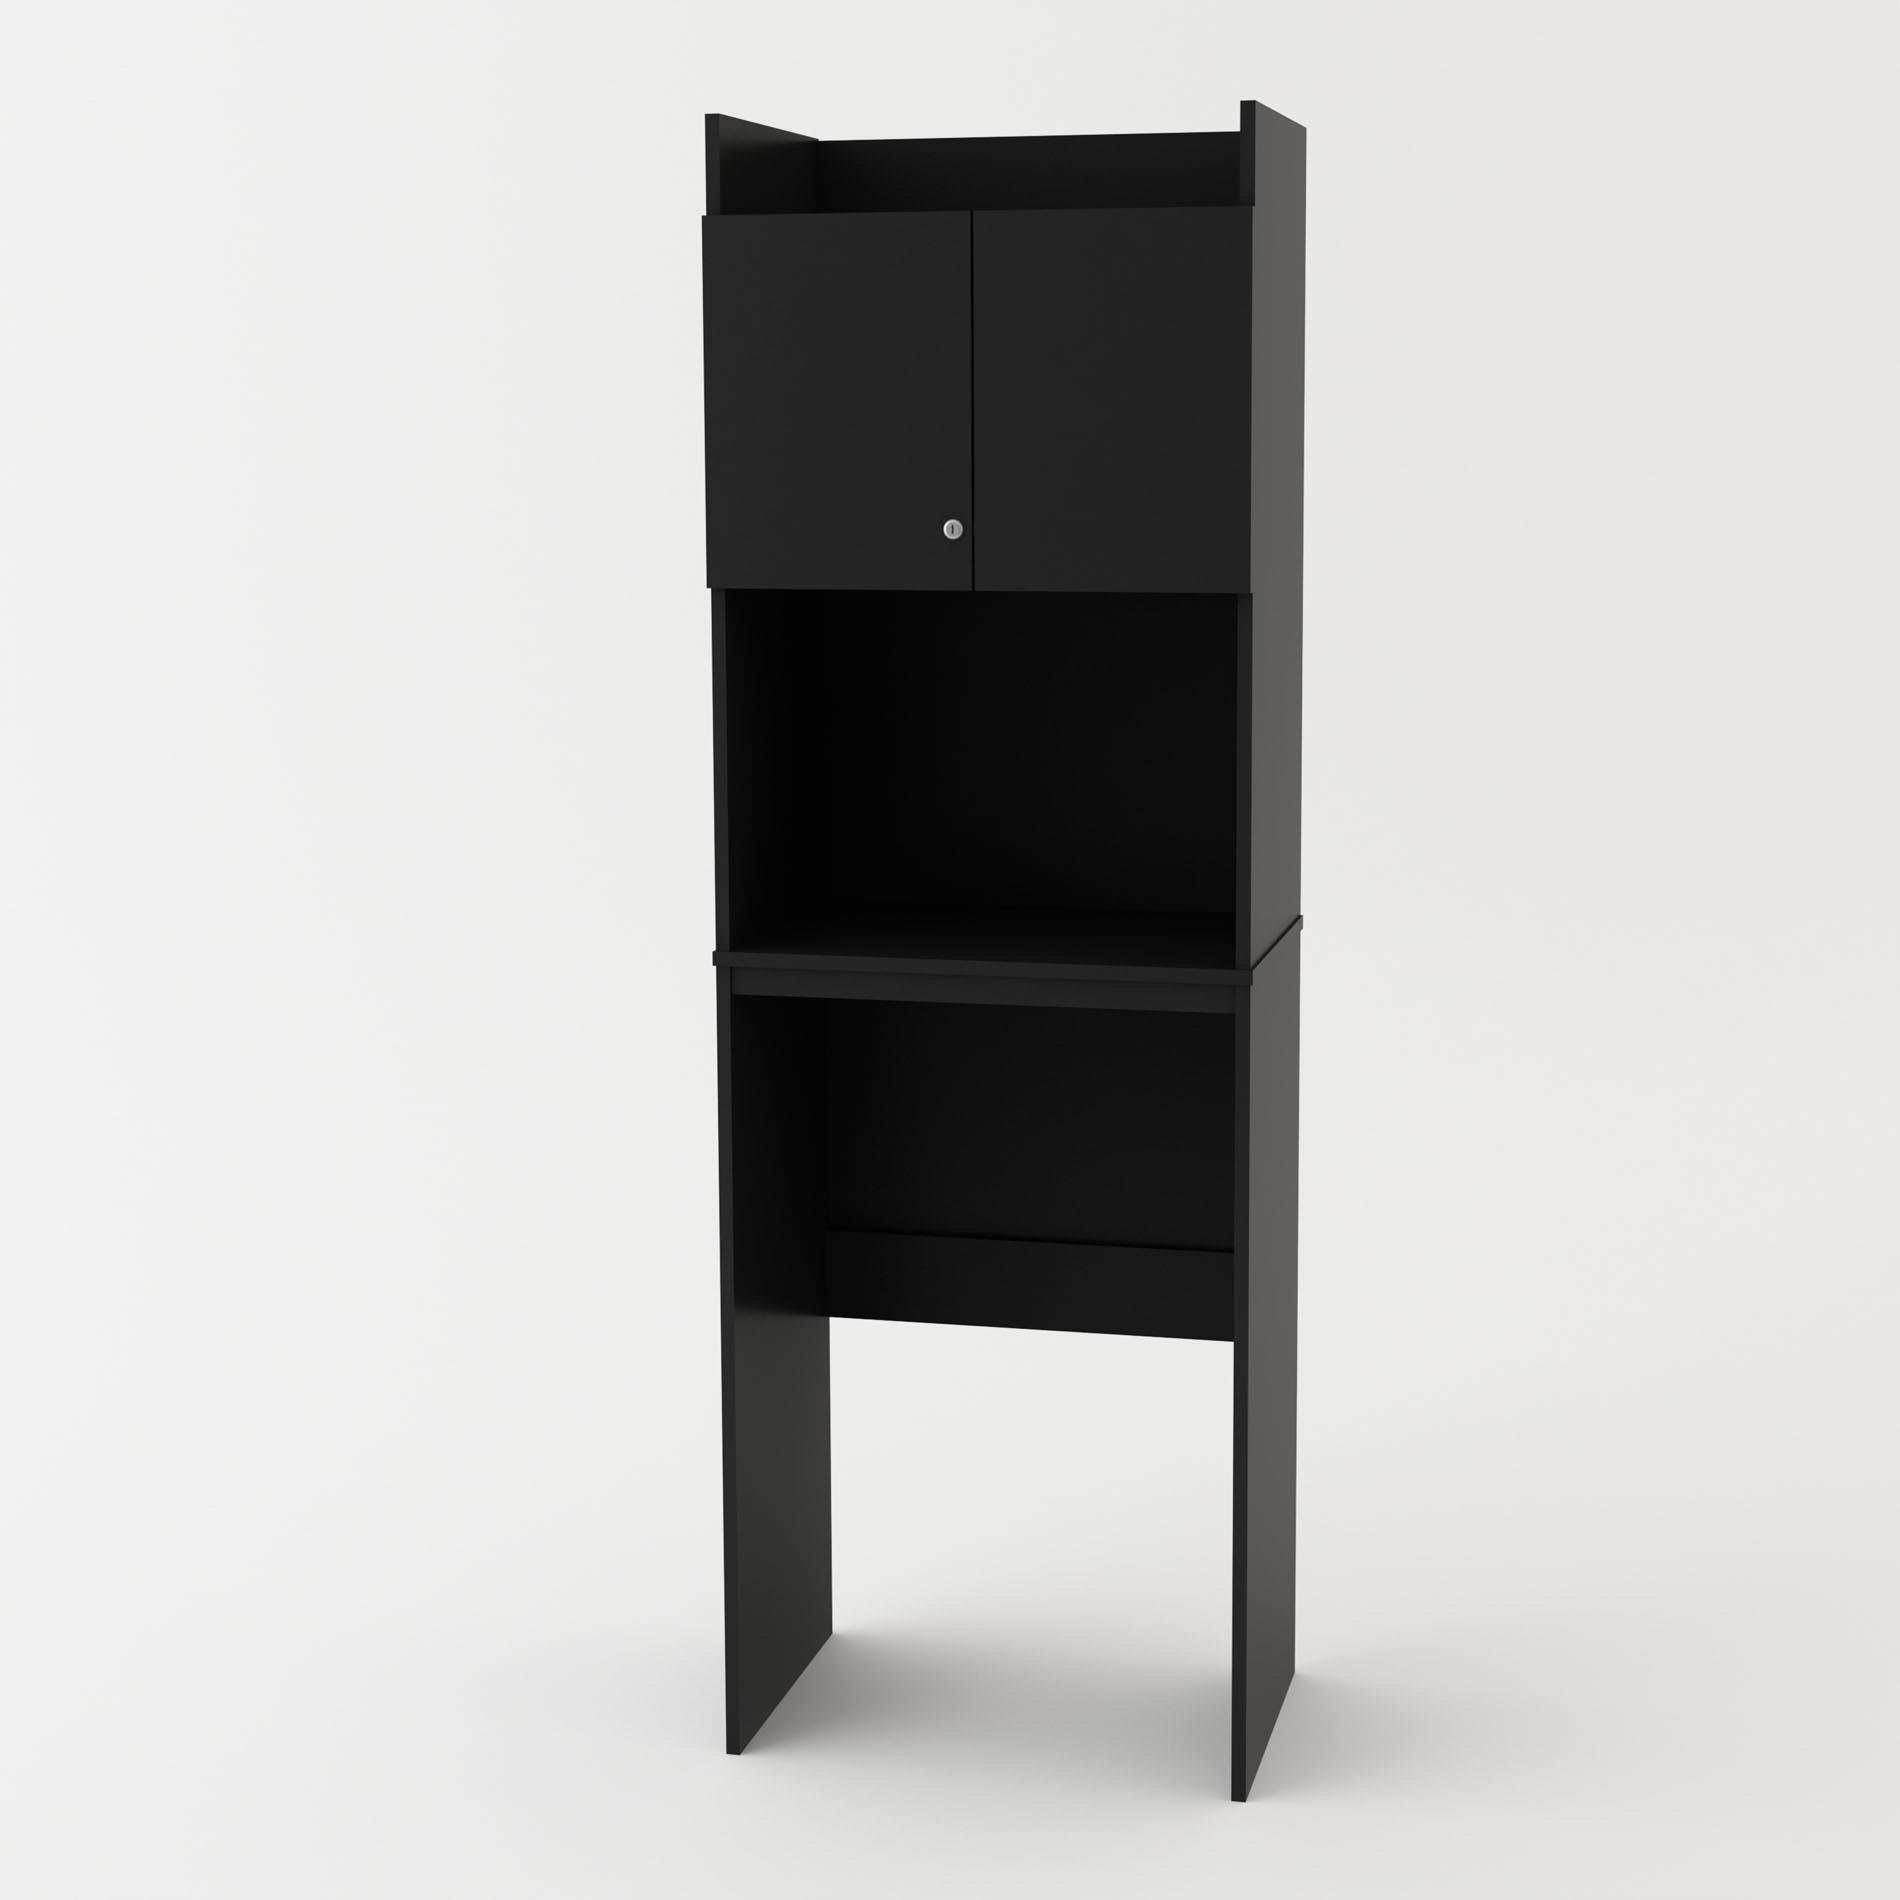 SystemBuild Ameriwood Clarkson Mini Refrigerator Storage Cabinet (Black)